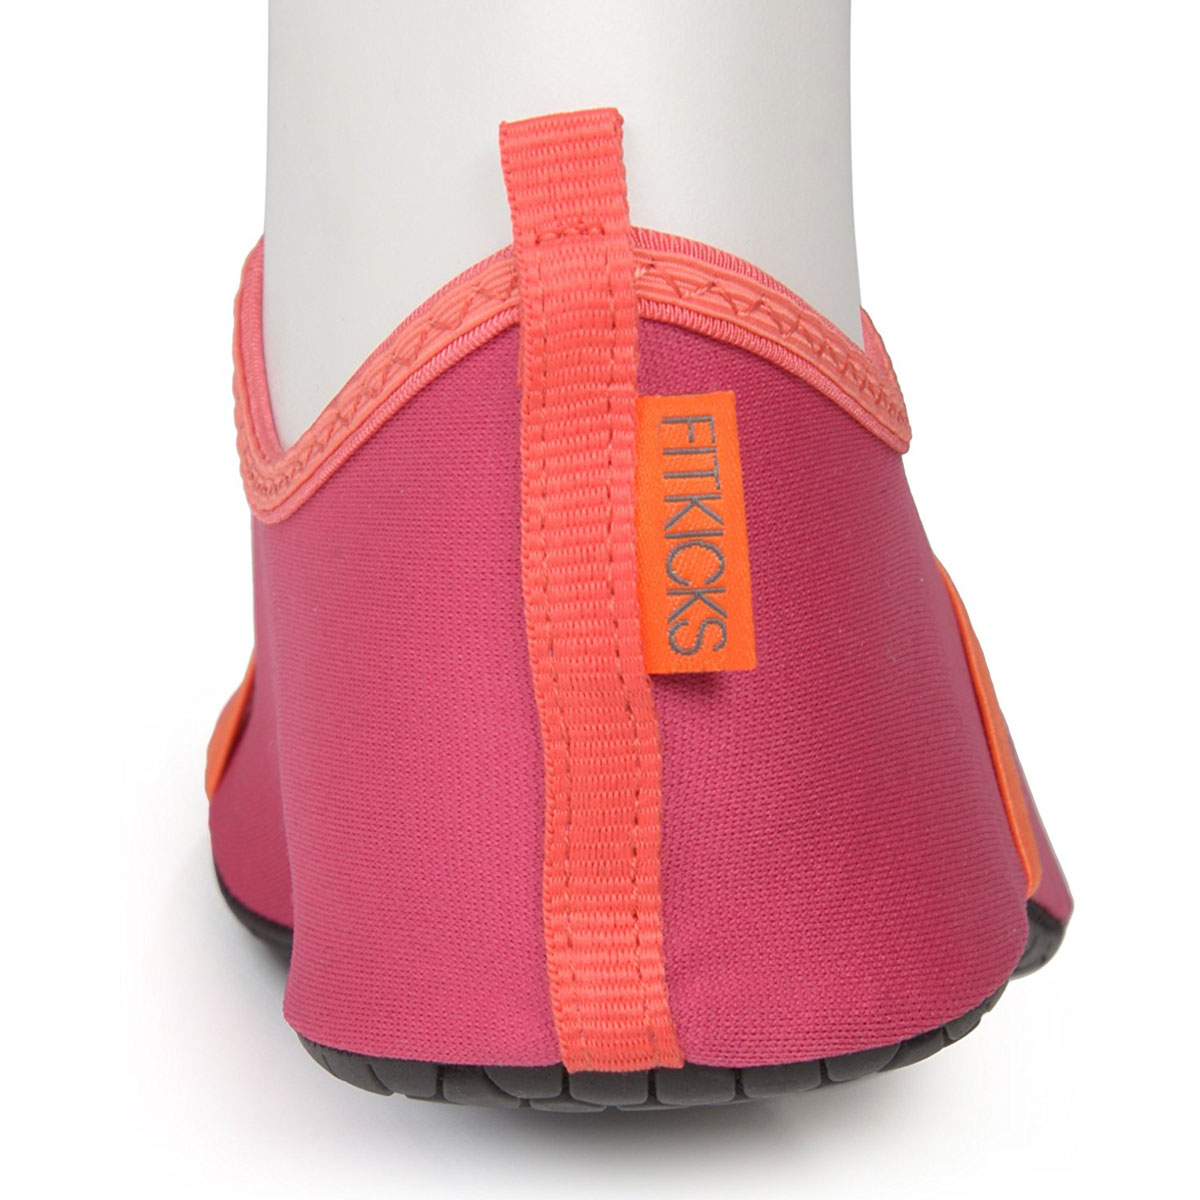 FitKicks-Women-039-s-Non-Slip-Sole-Active-Footwear thumbnail 18